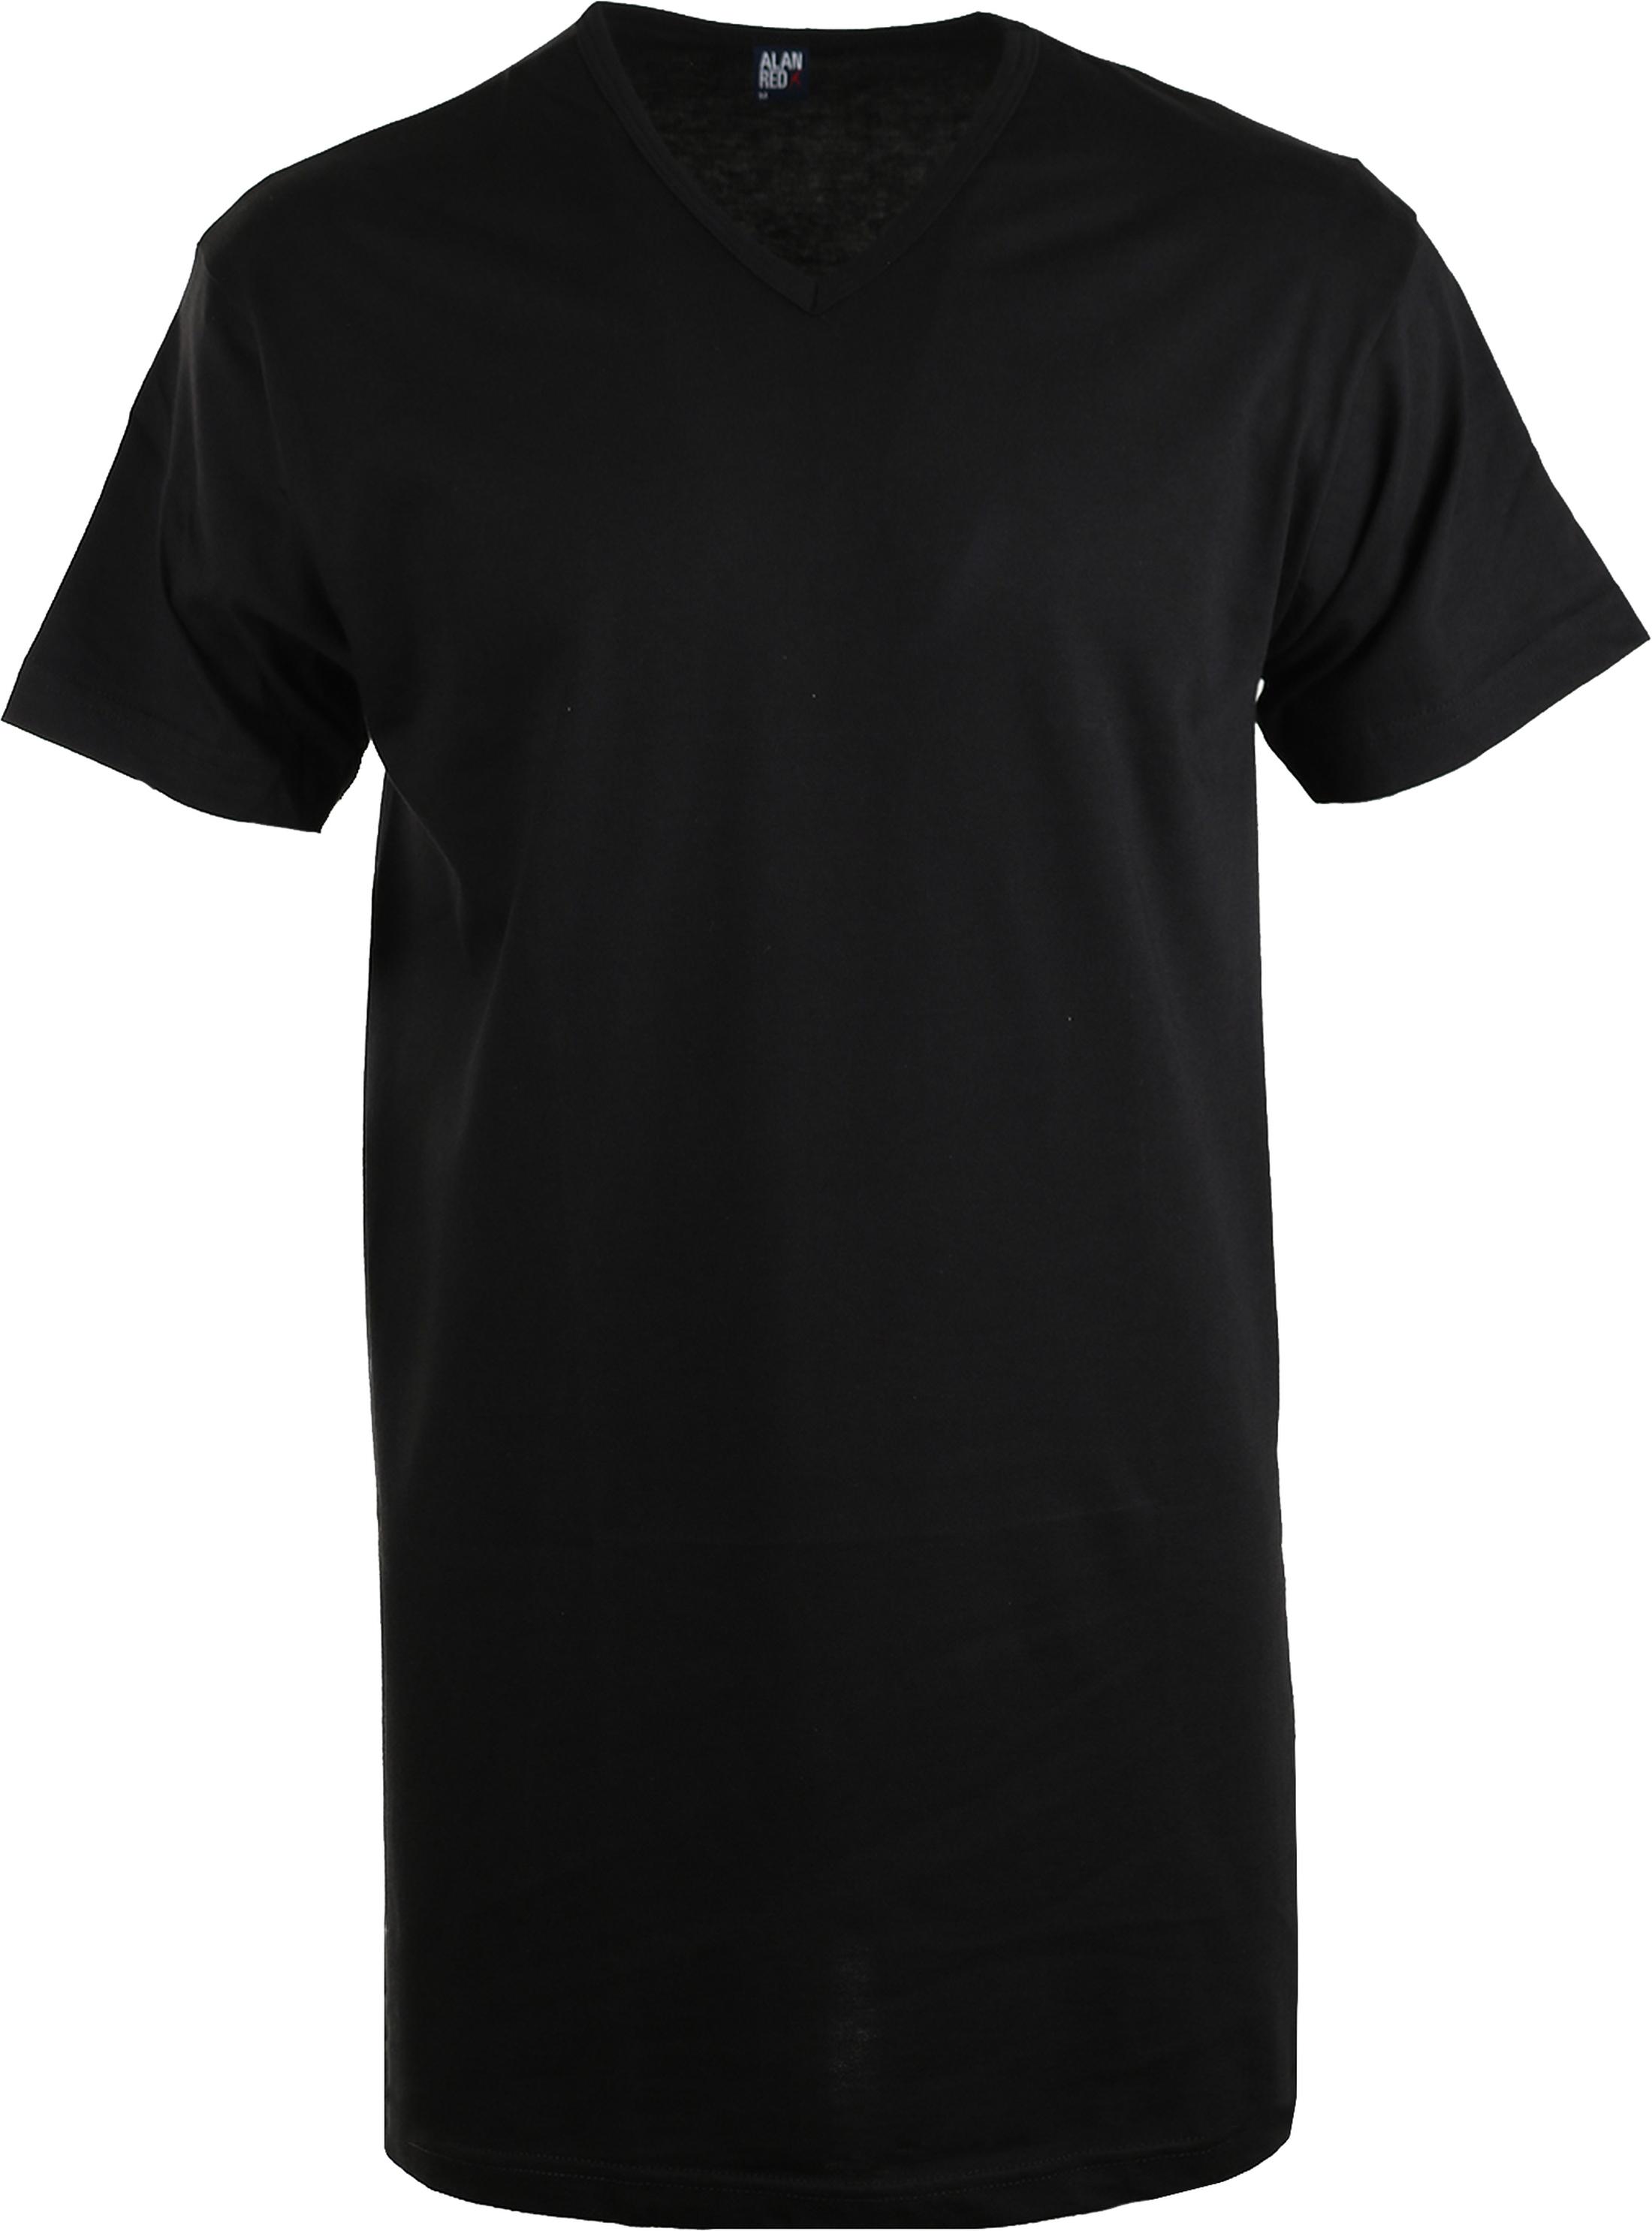 Alan Red Extra Lang T-Shirts Vermont Schwarz (1-Pack) foto 0